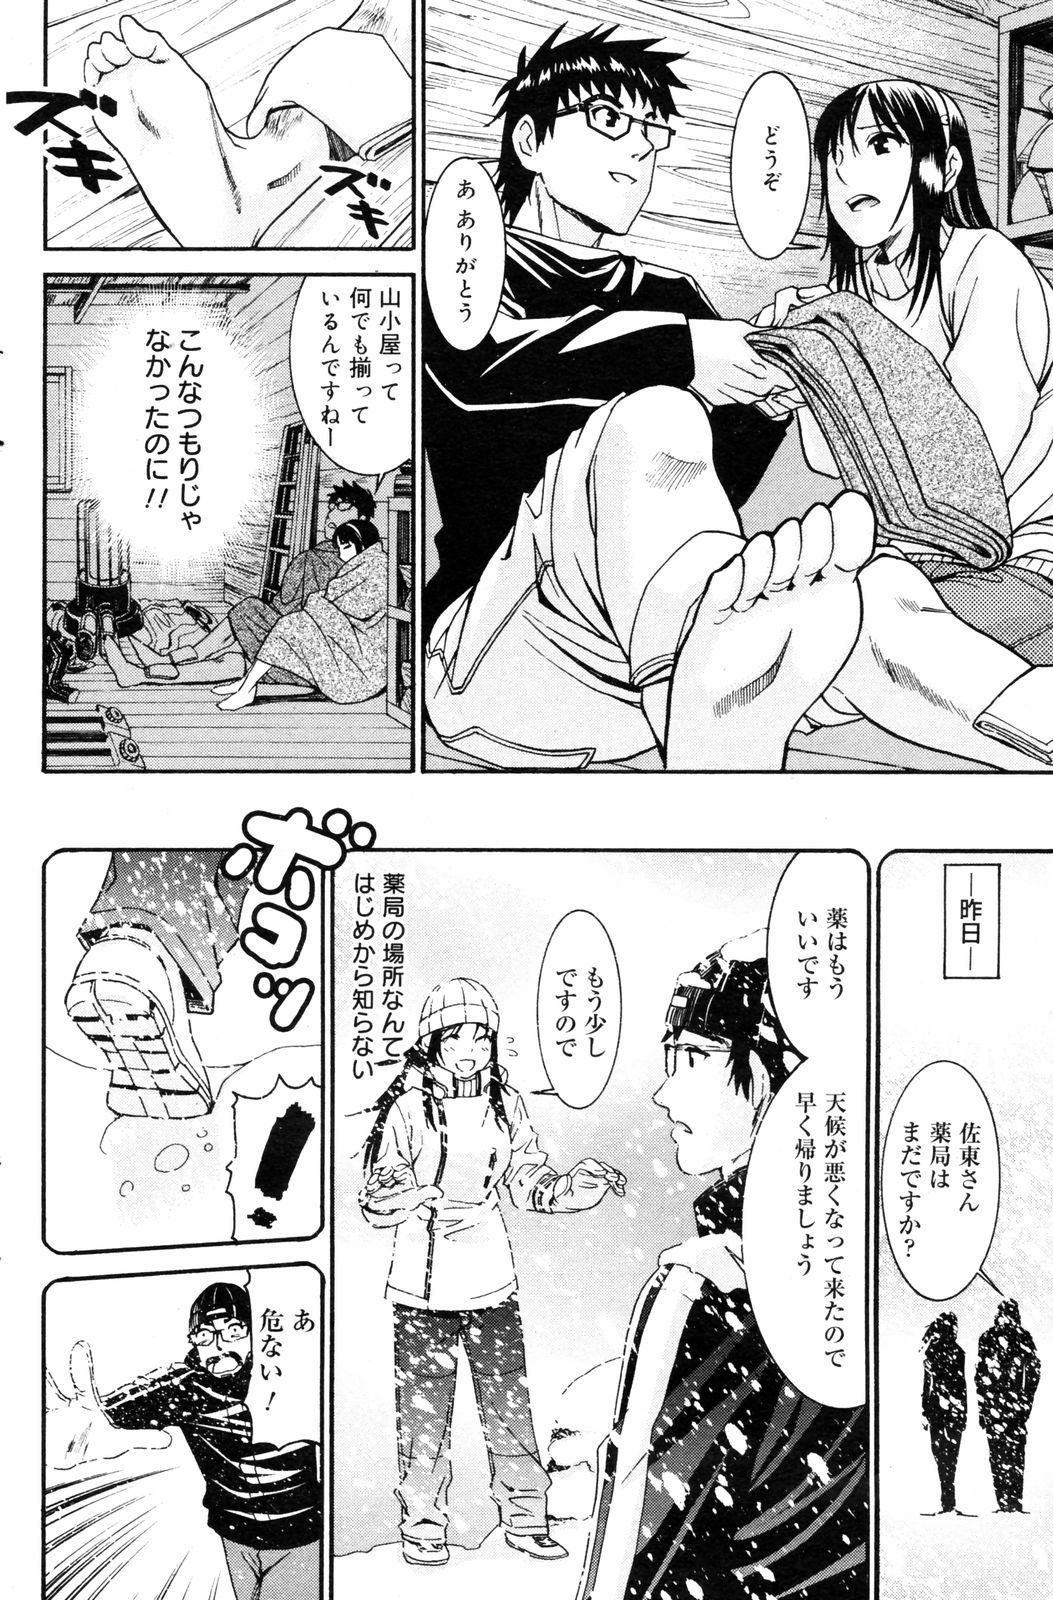 Manga Bangaichi 2008-03 135